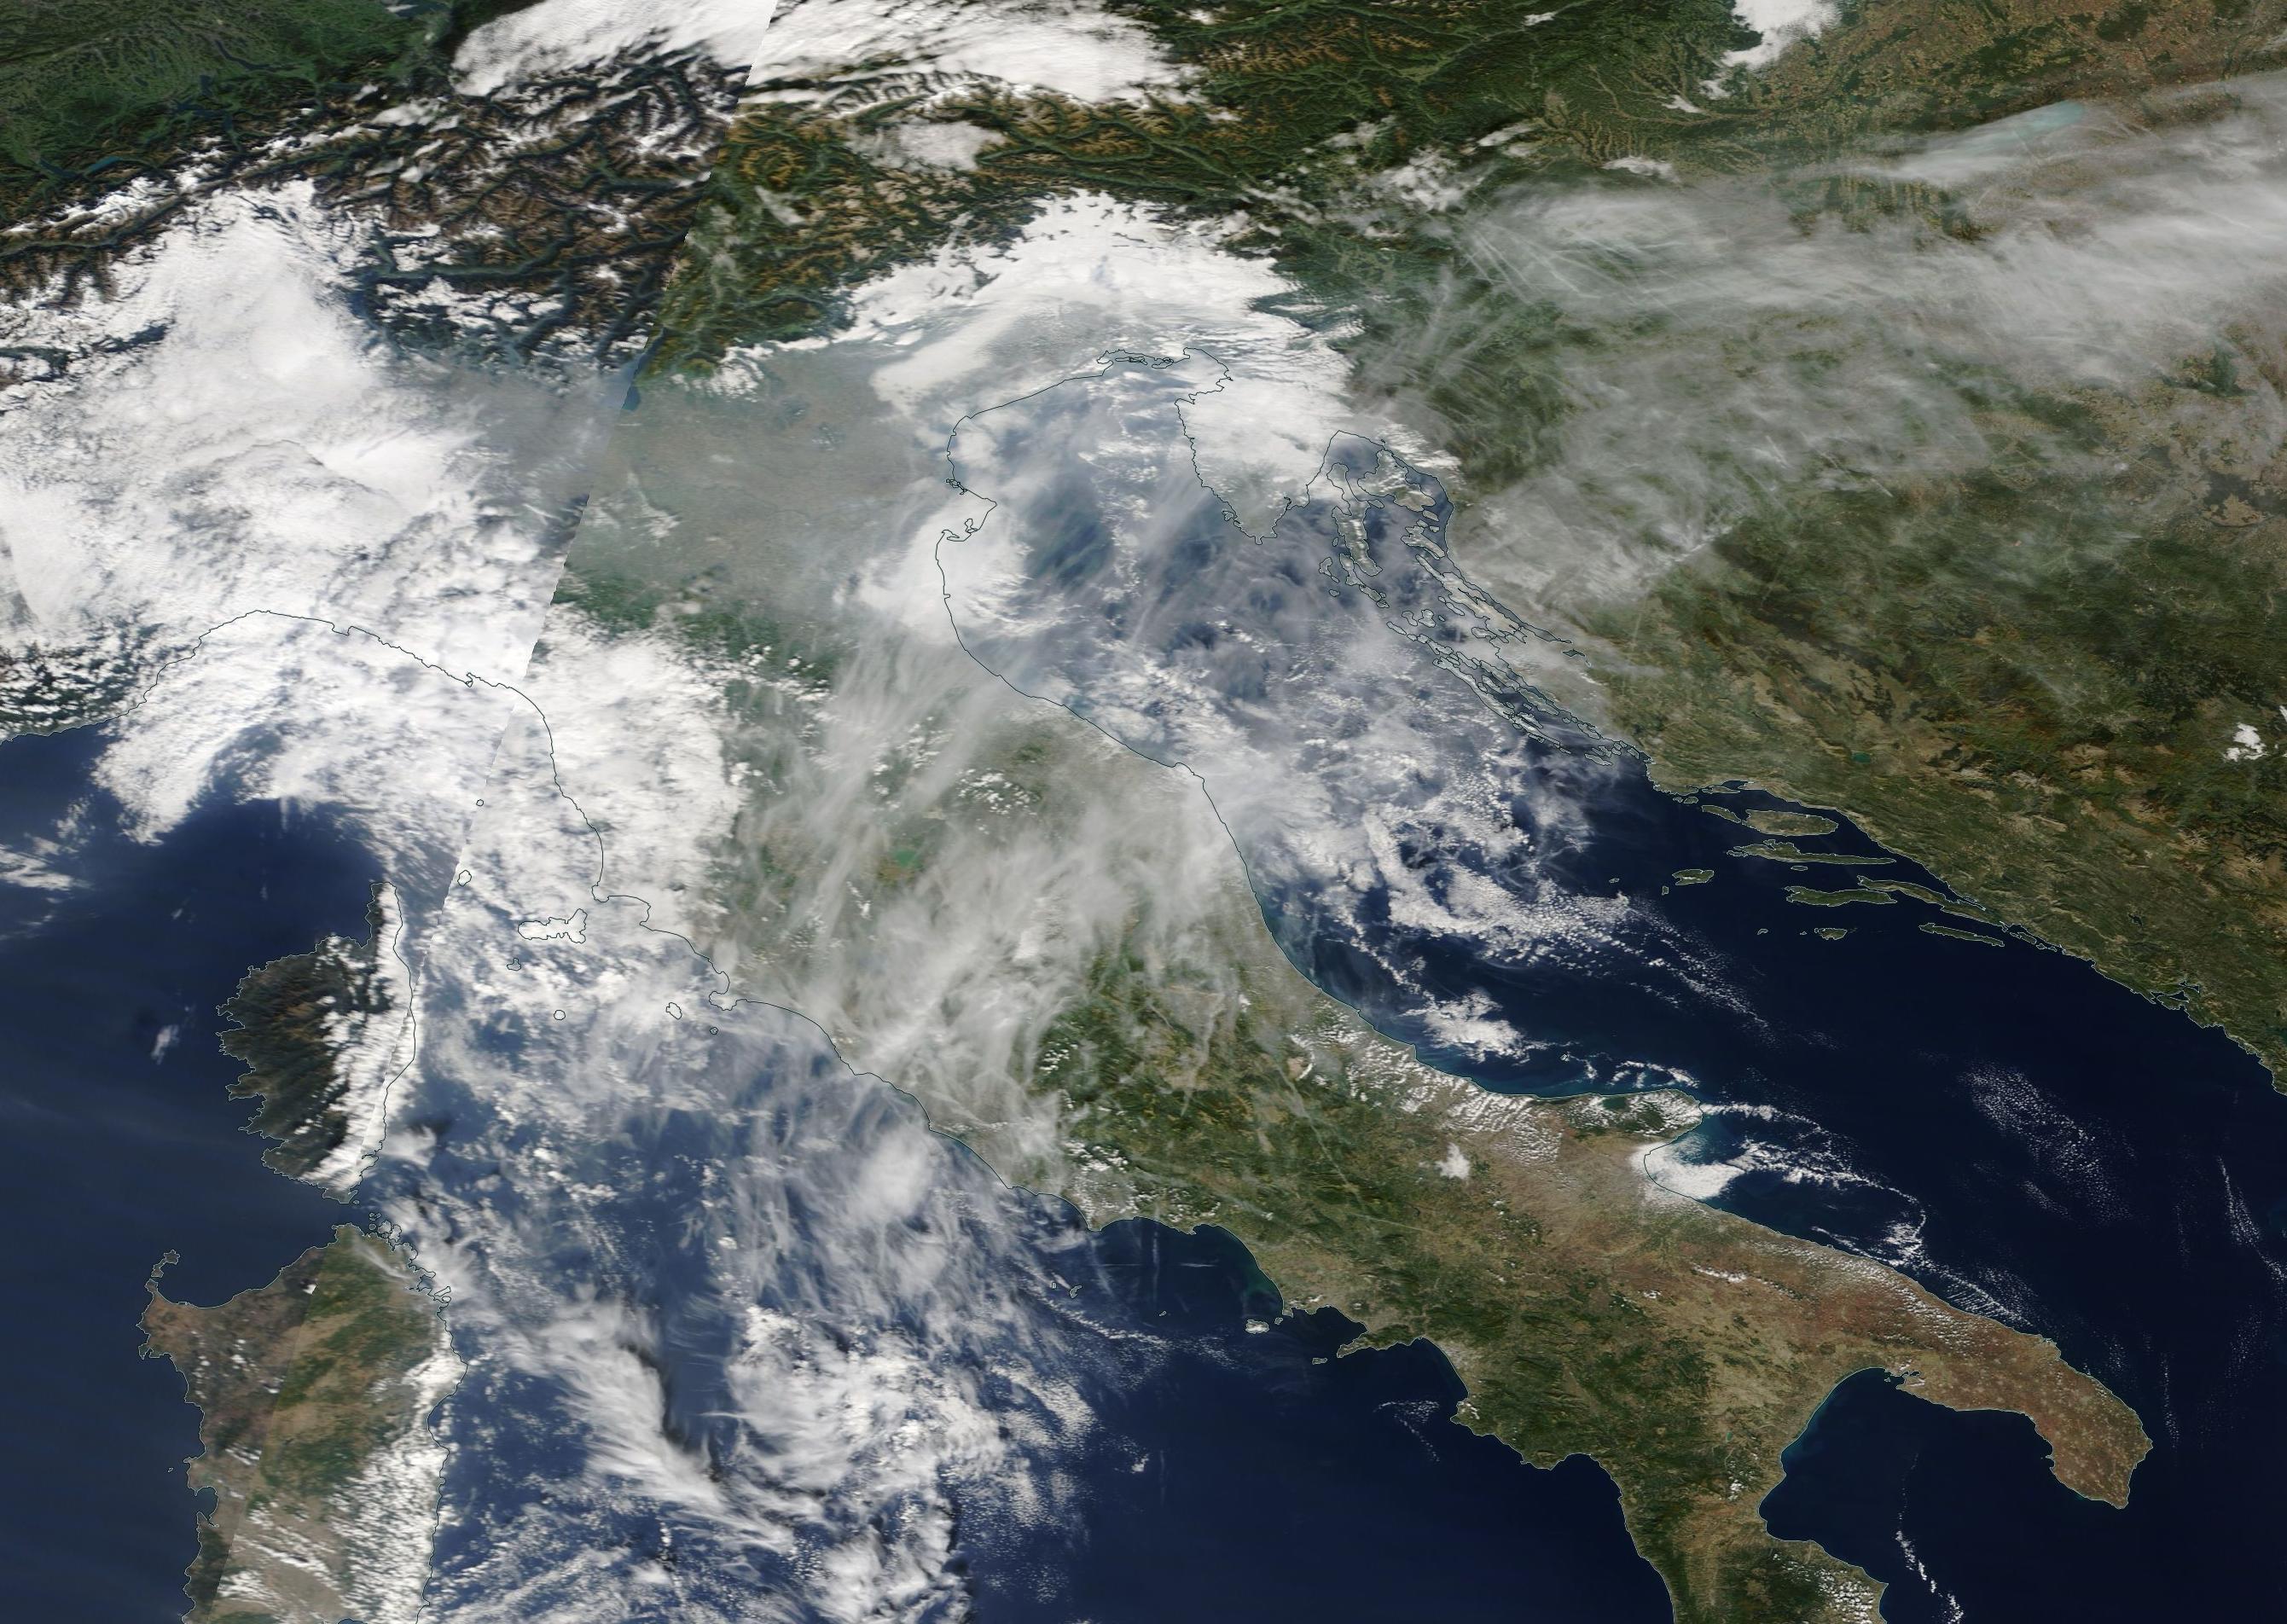 Rome, San Marino, Trieste, the Adriatic, chemtrail geoengineering 14th October 2019https://go.nasa.gov/2Bd939V